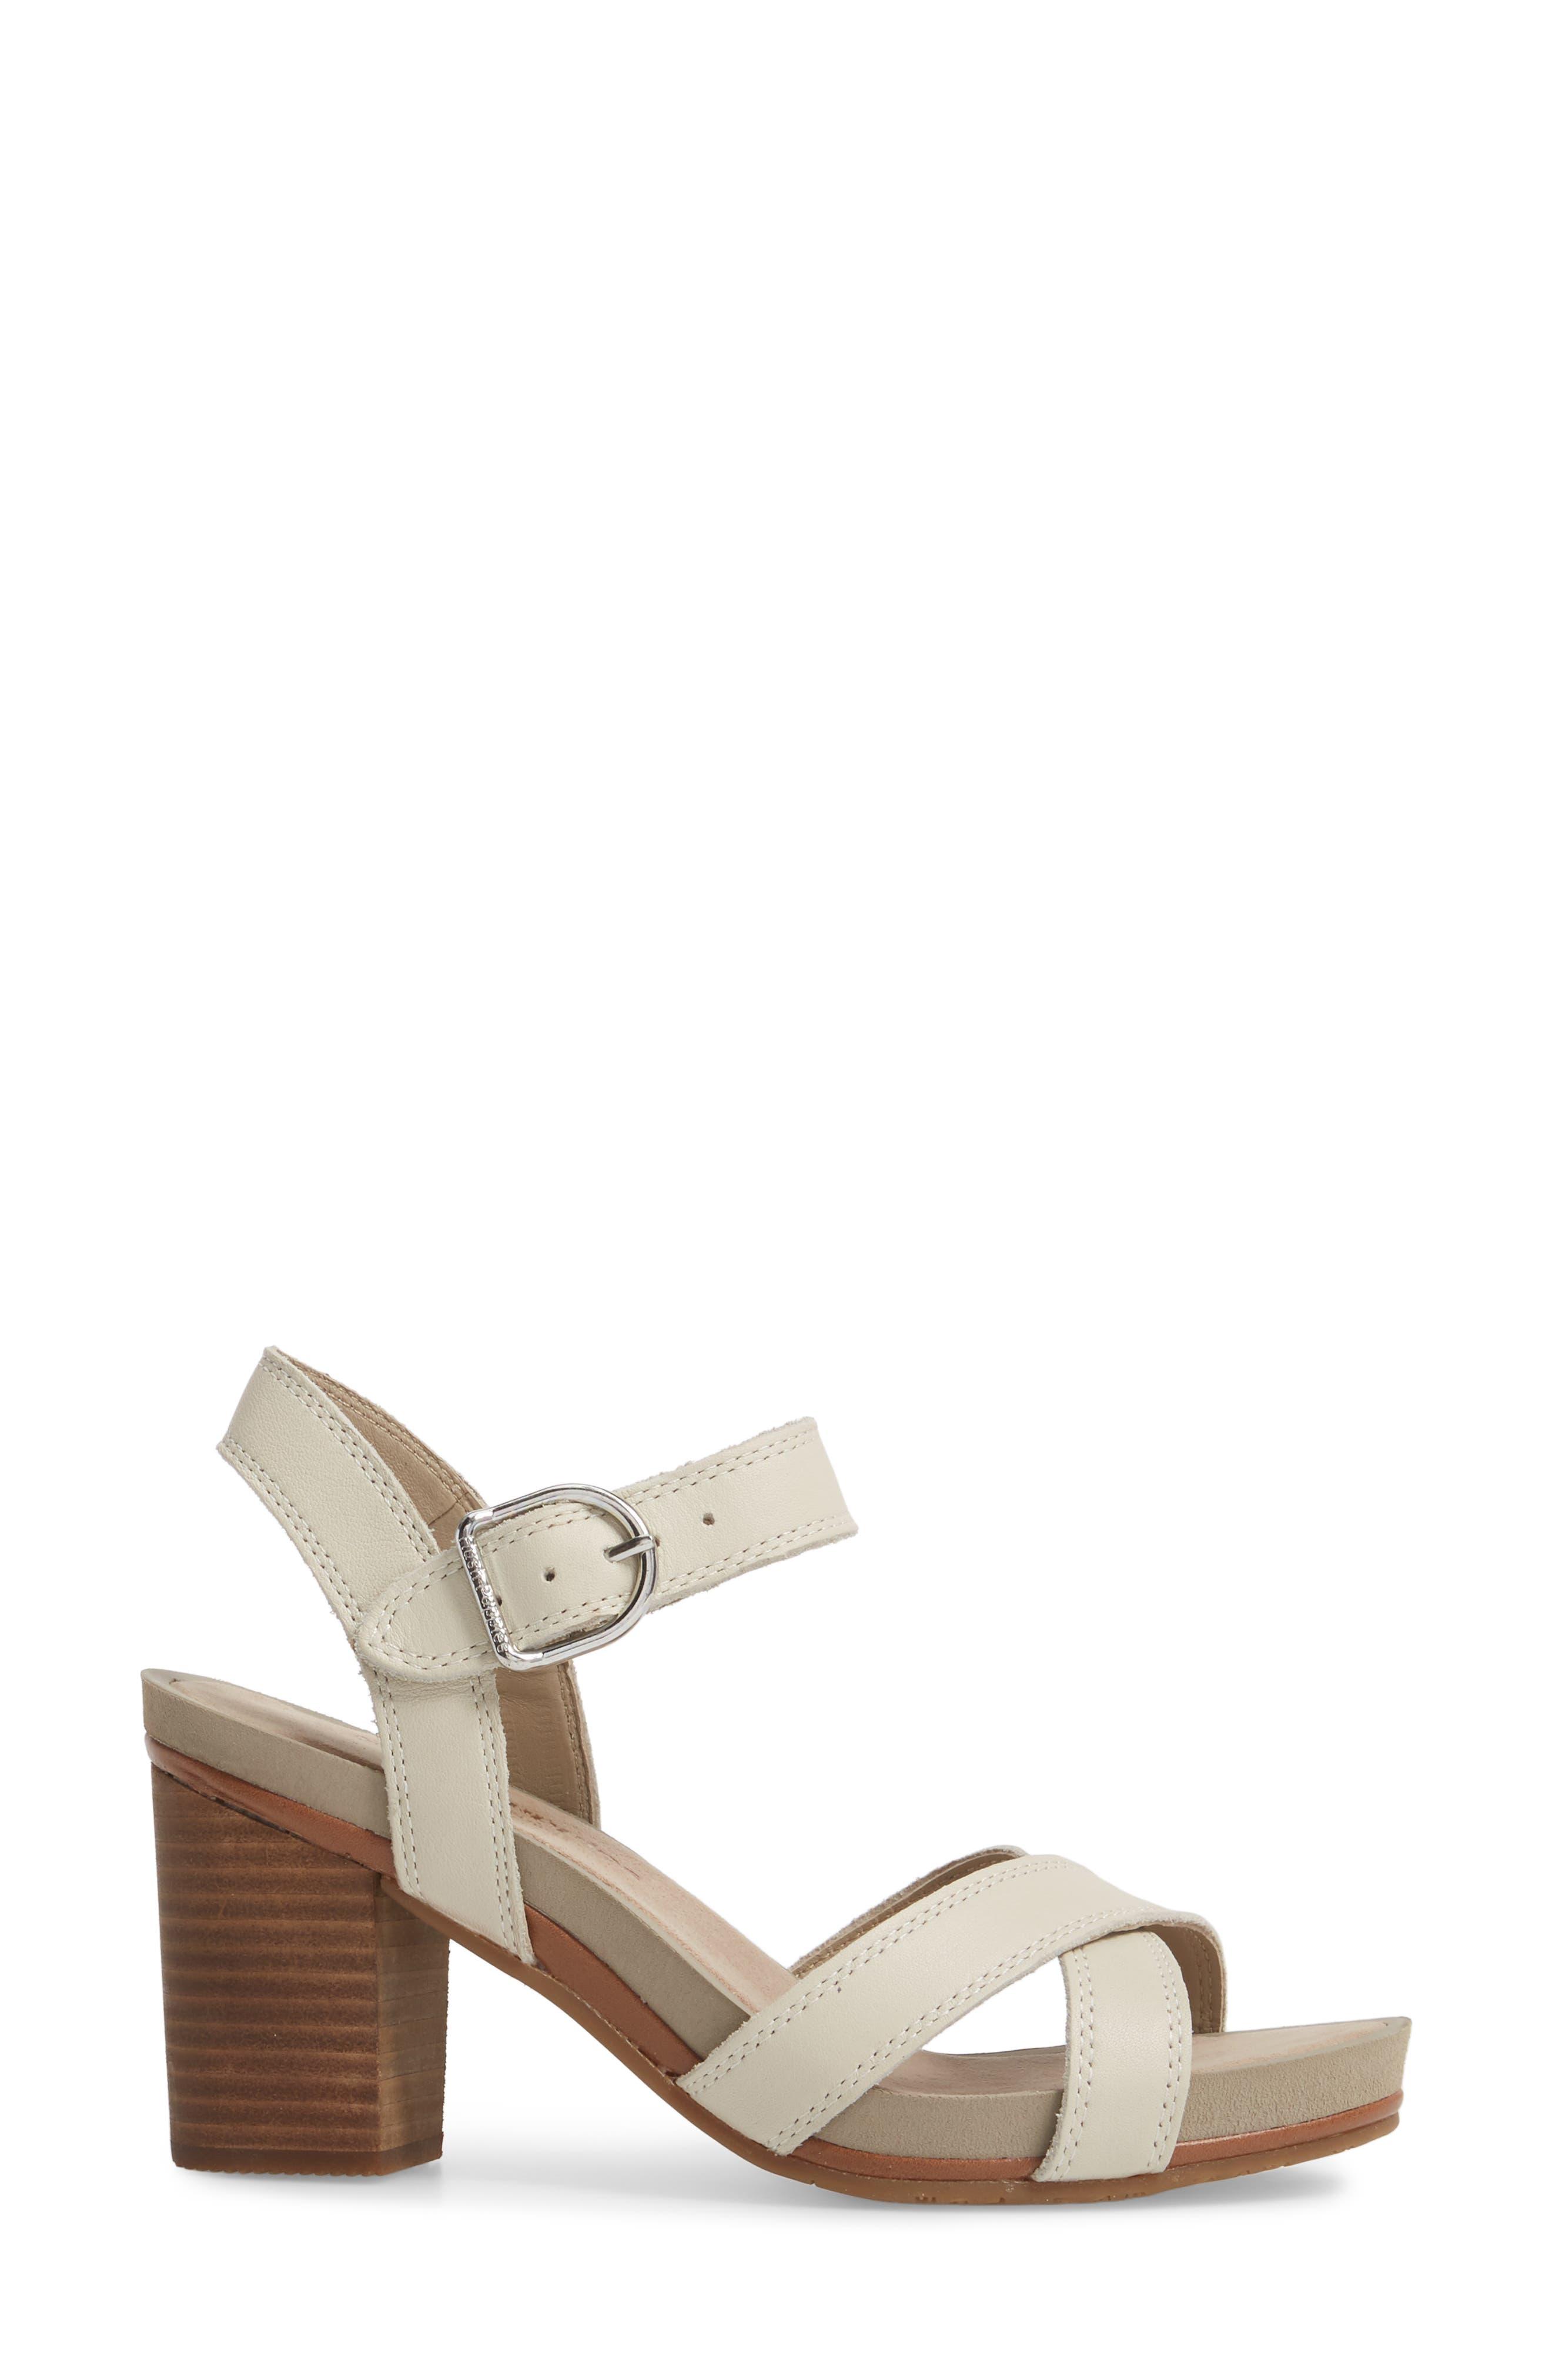 Mariska Block Heel Sandal,                             Alternate thumbnail 6, color,